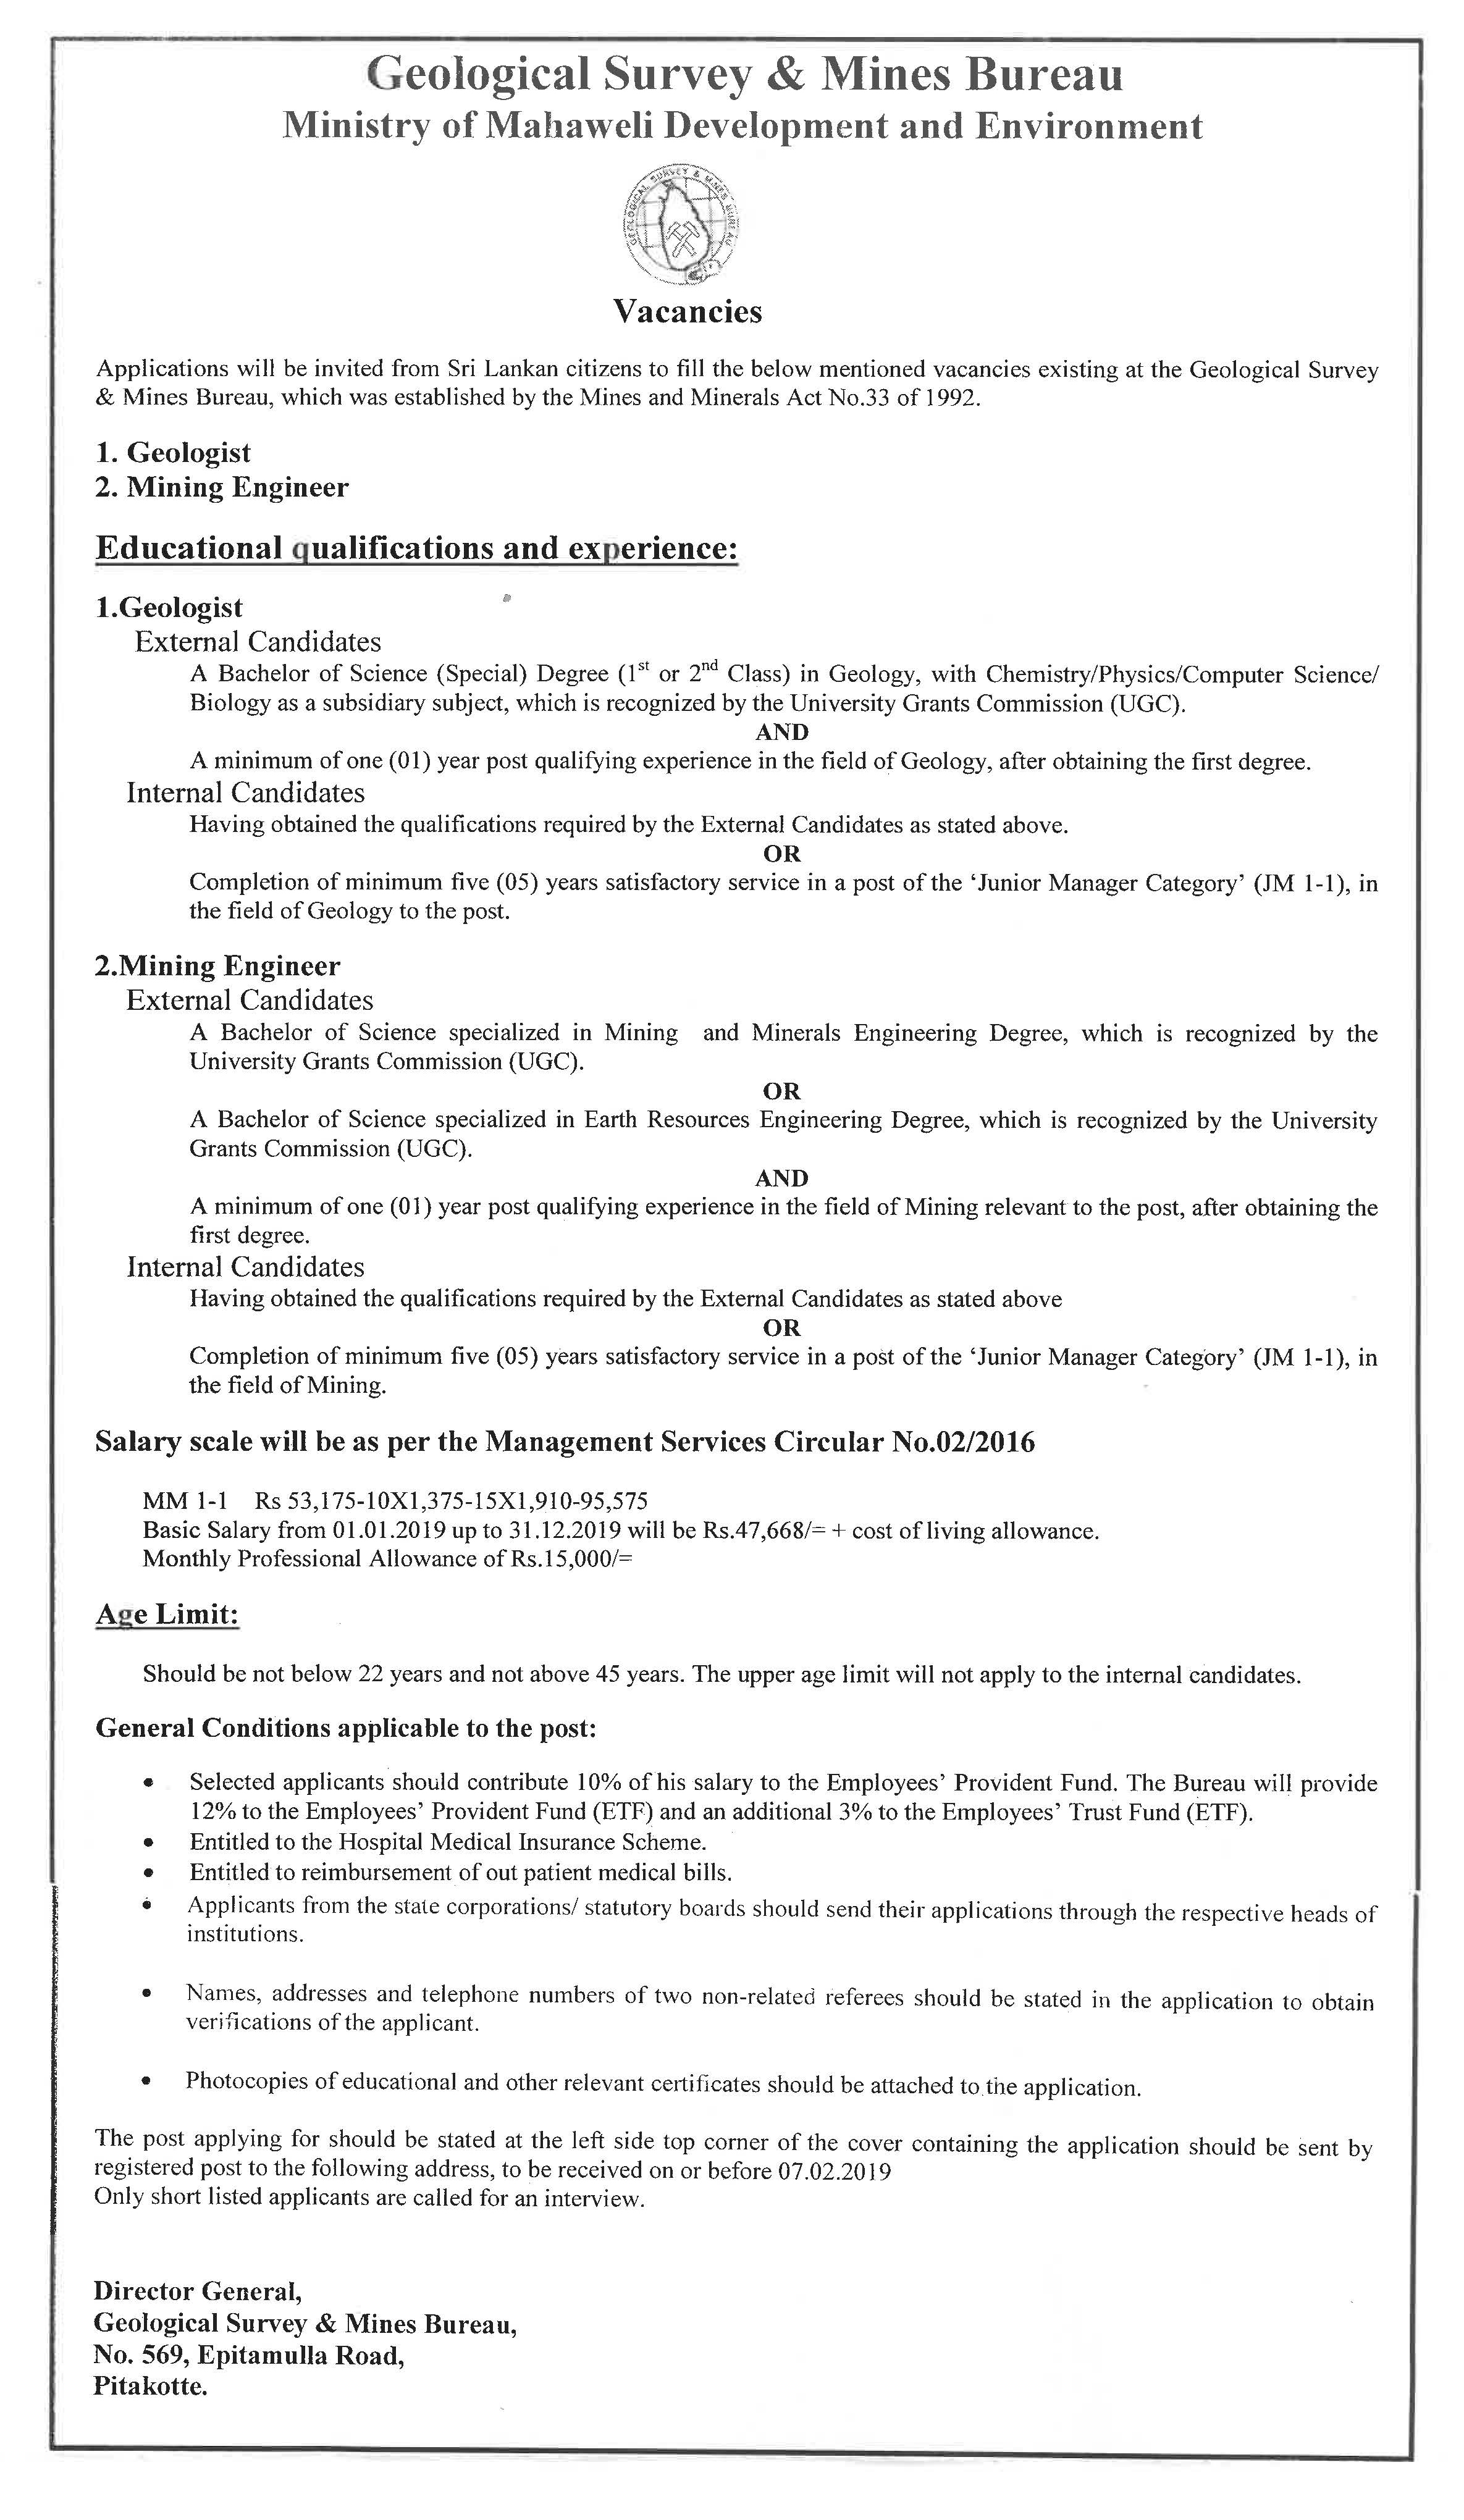 Vacancies -Geologist, Mining Engineer